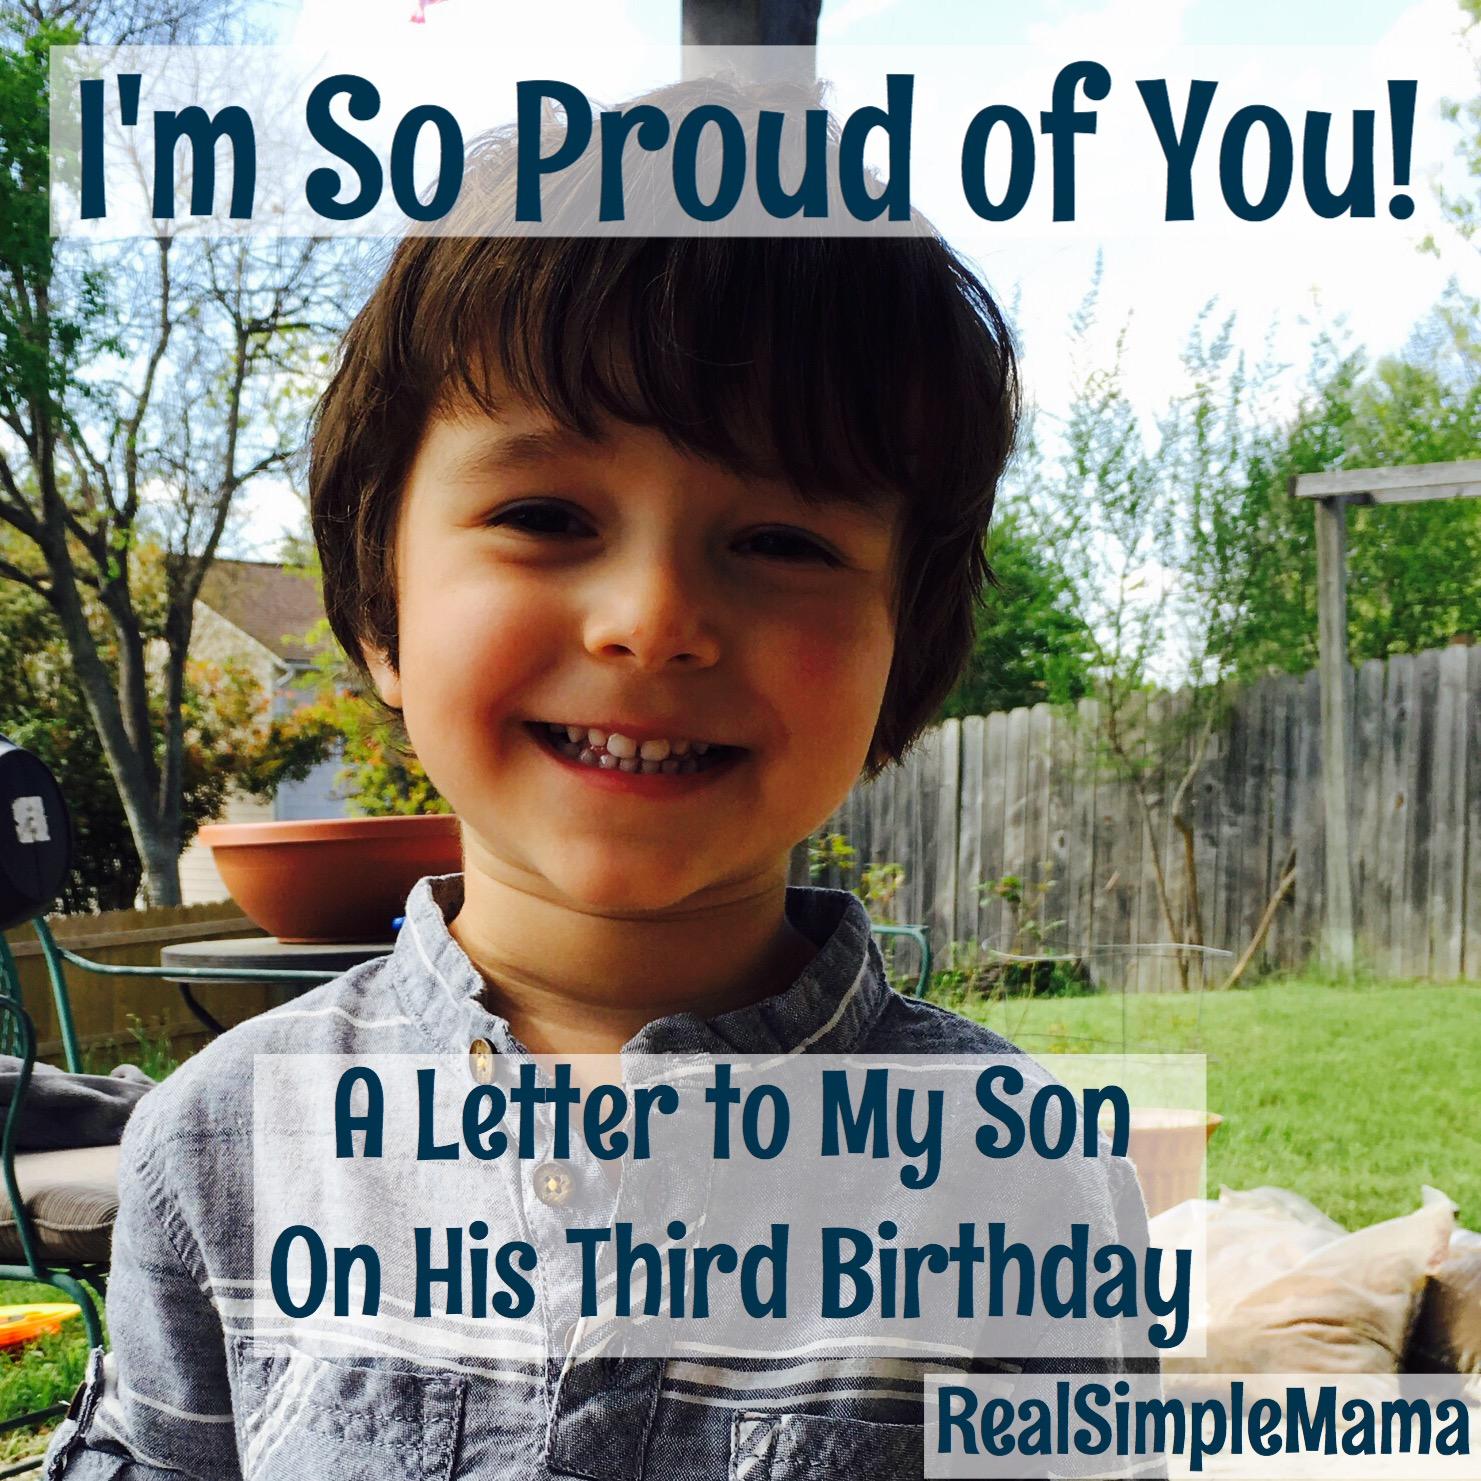 I'm So Proud Of You: A Letter To My Son On His Third